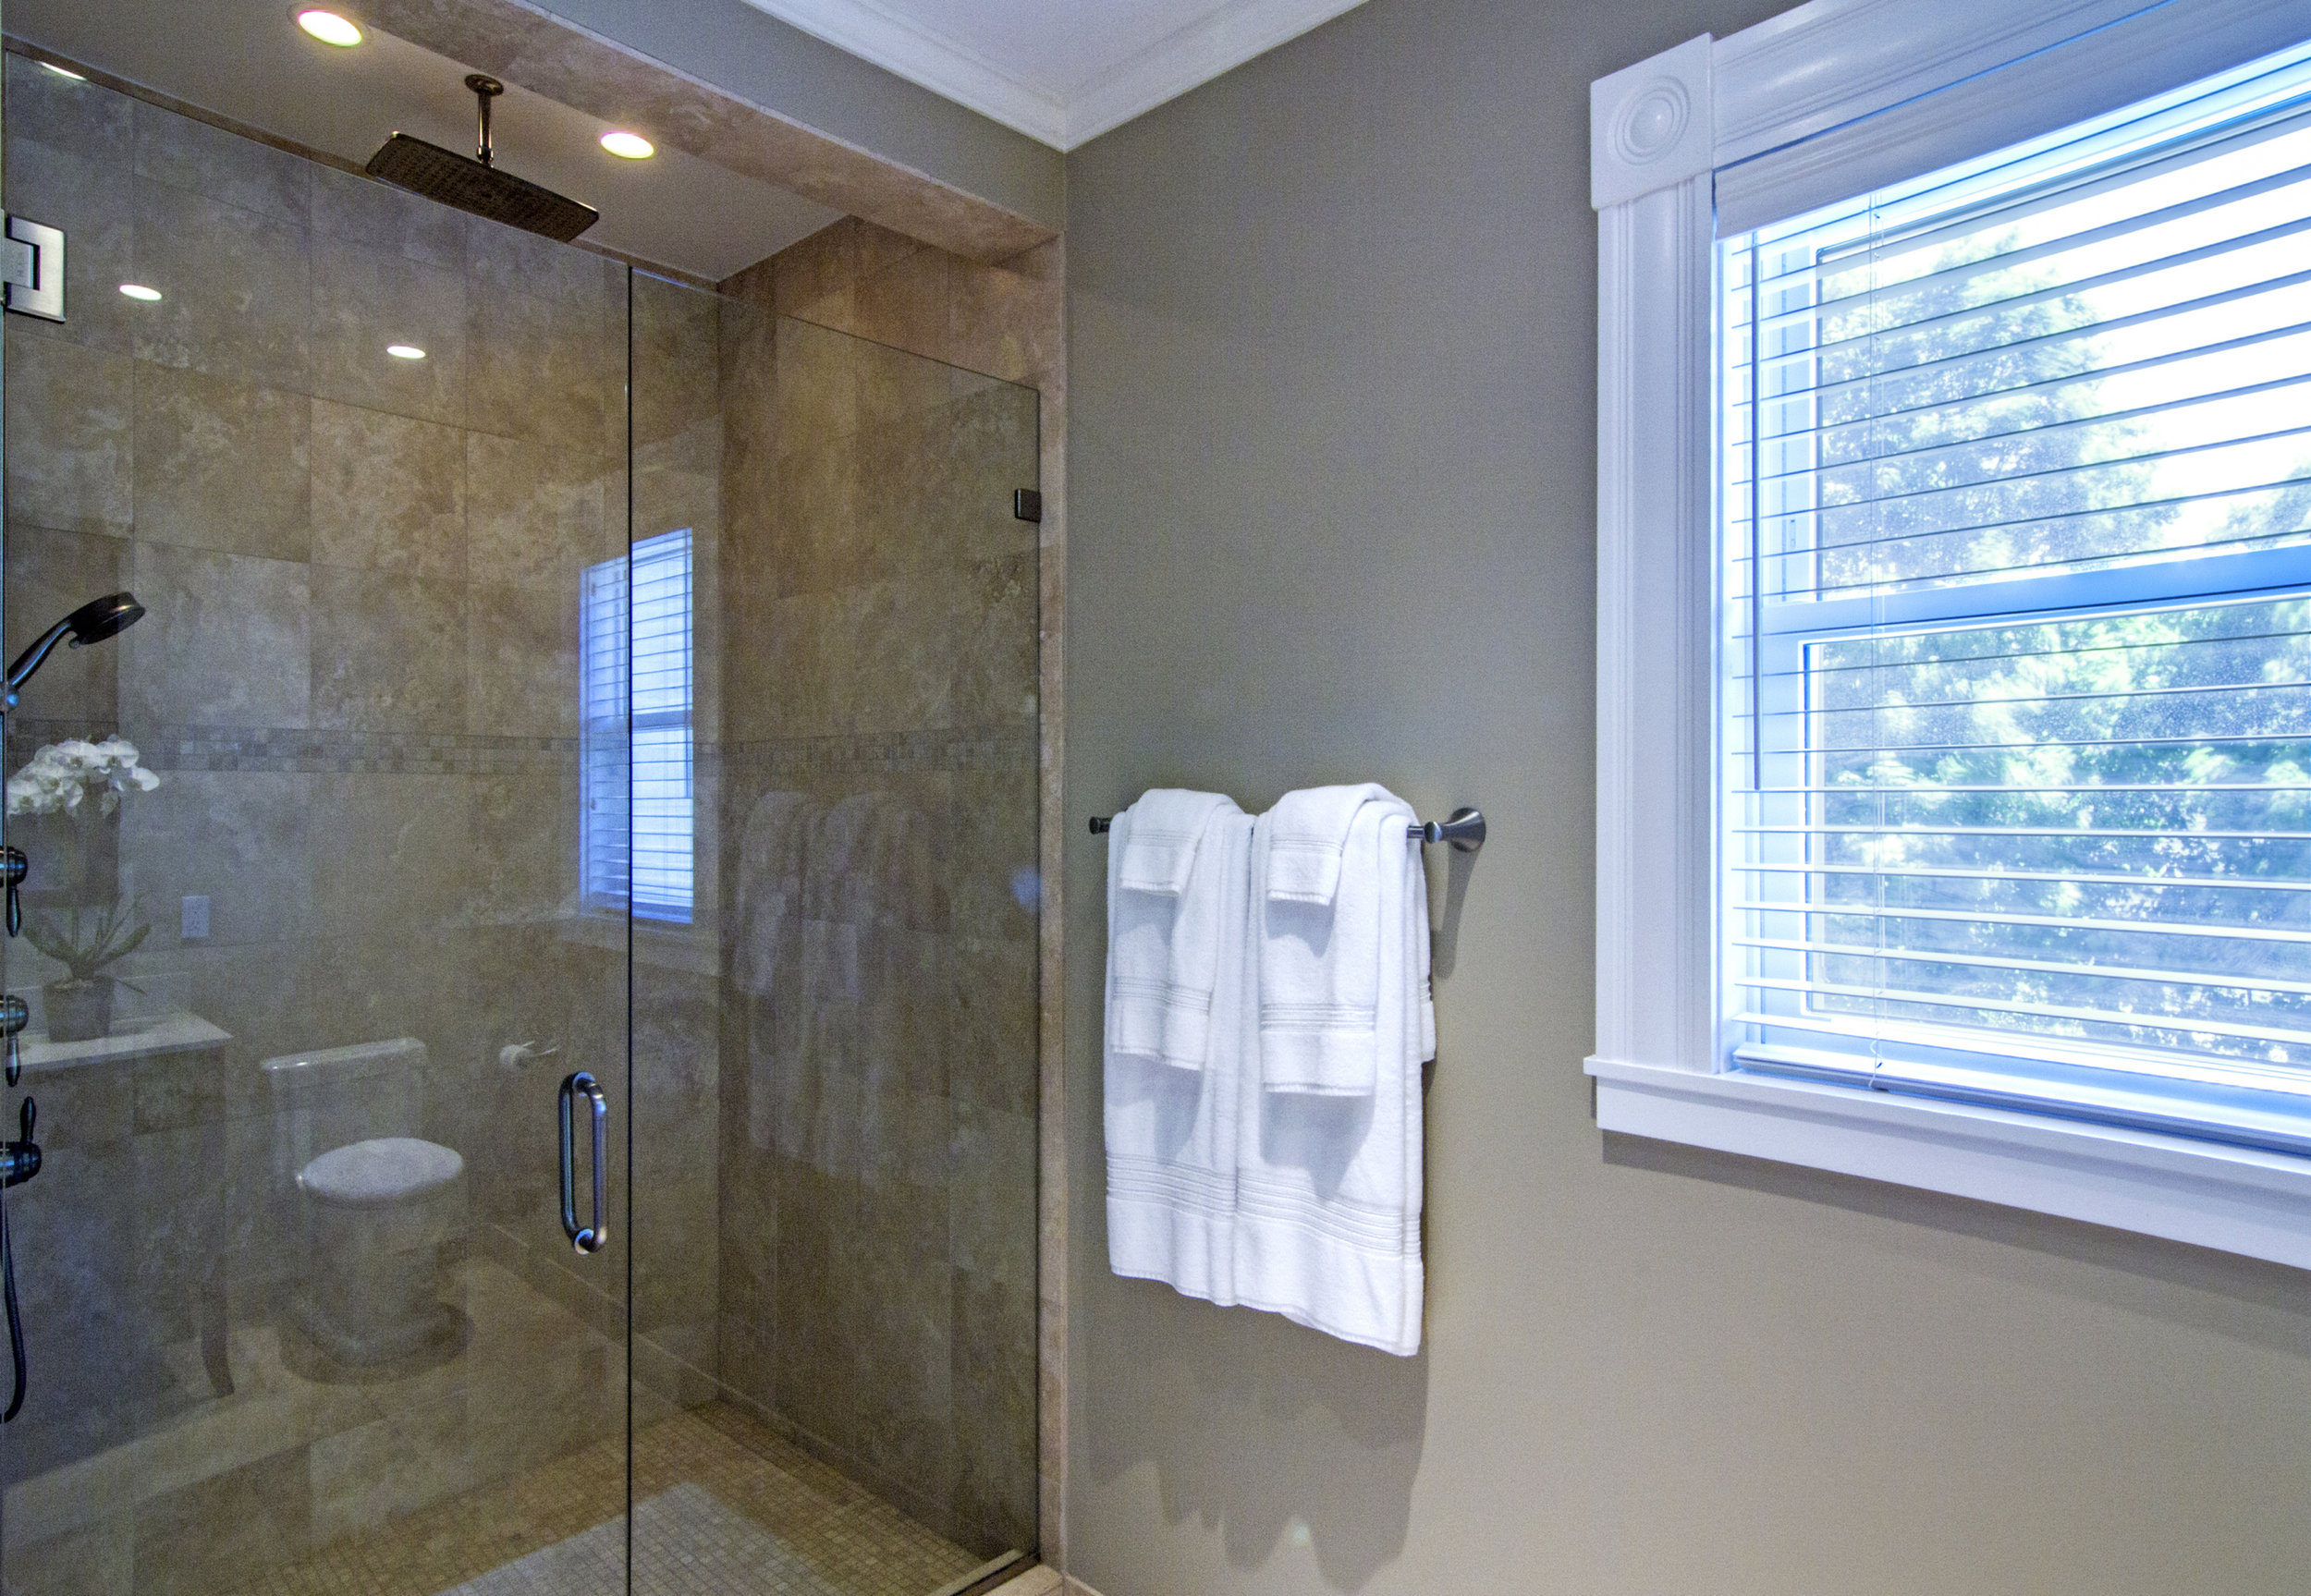 27-2017-06-14 IMG_3839 May Peterson 2nd Floor Shower.jpg